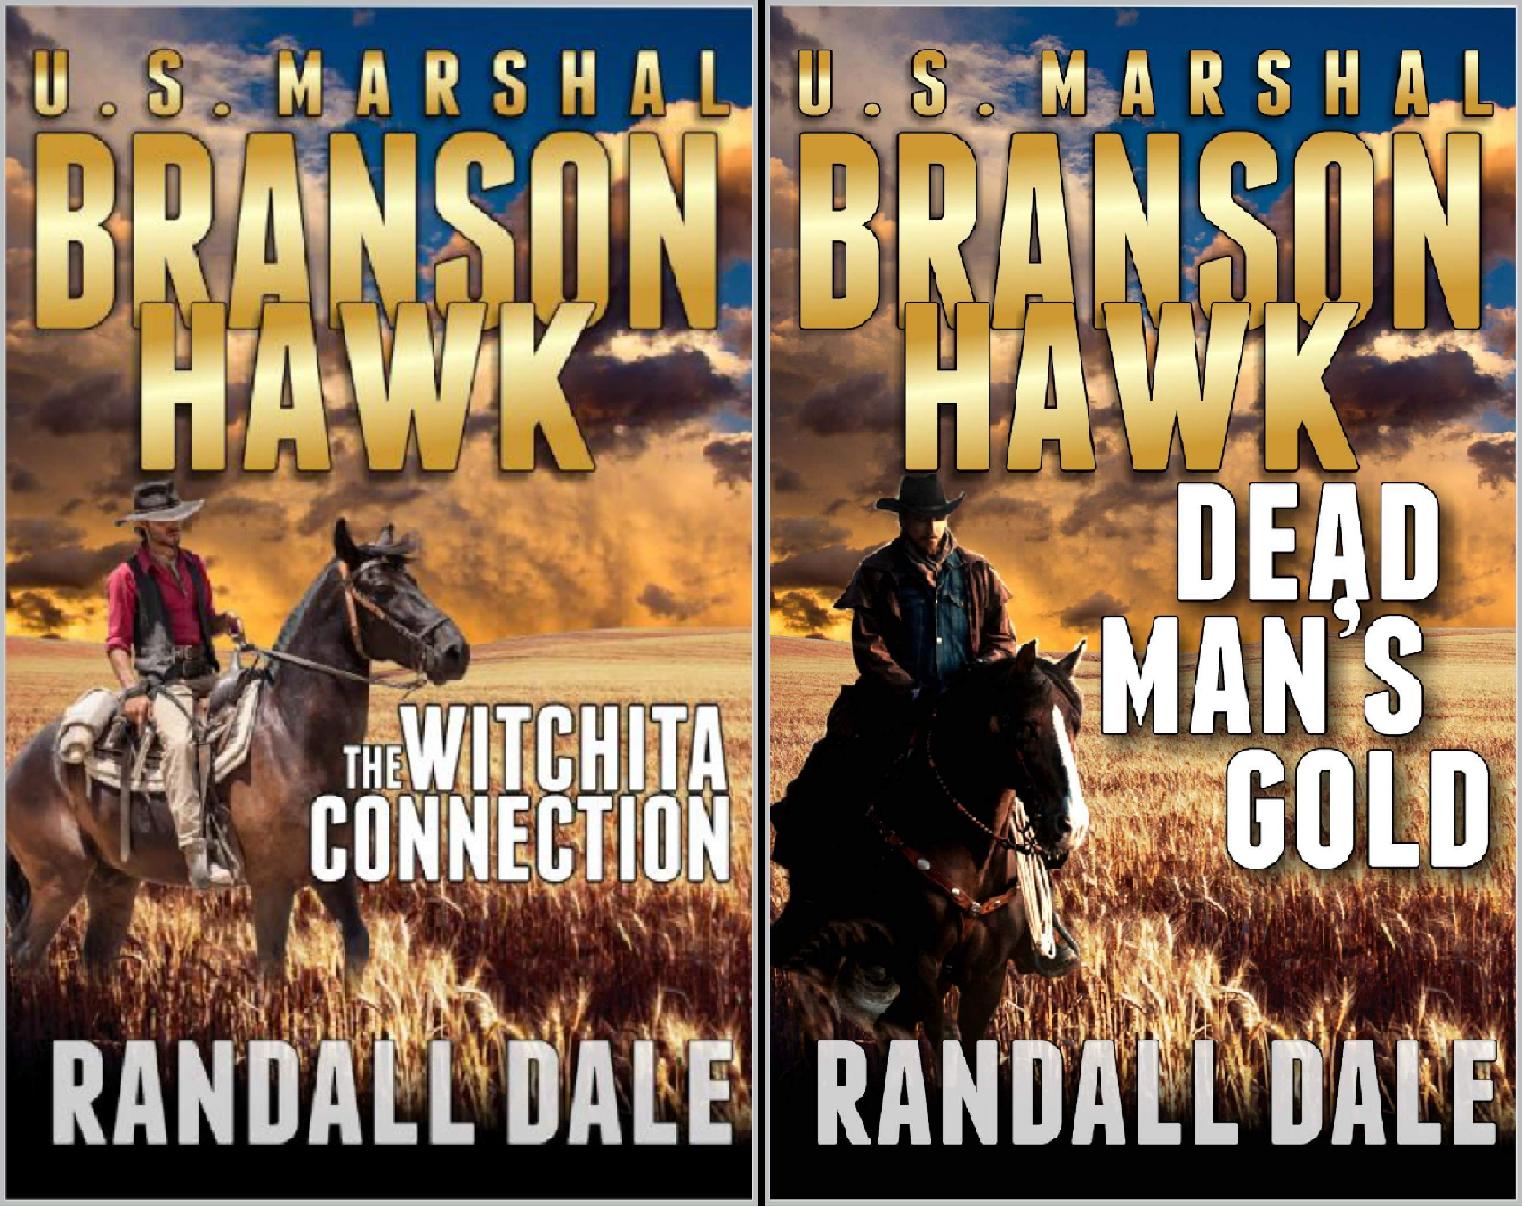 Branson Hawk: United States Marshal Western Series (2 Book Series) (Scott Wayne)